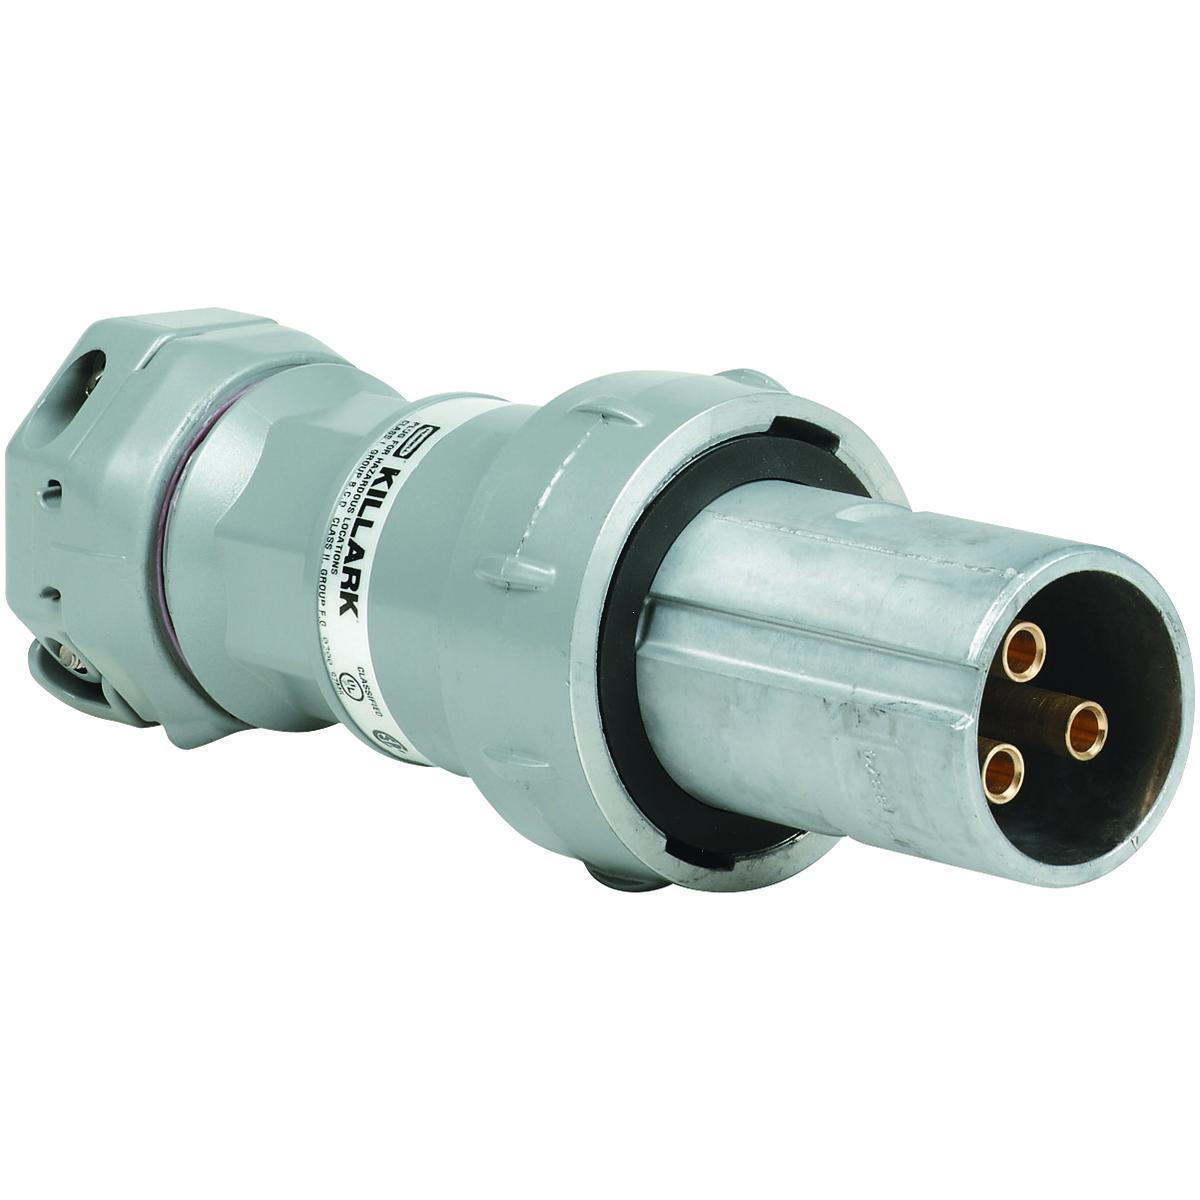 60A 2W 2P Details about  /KILLARK VP6275 Pin /& Sleeve Plug